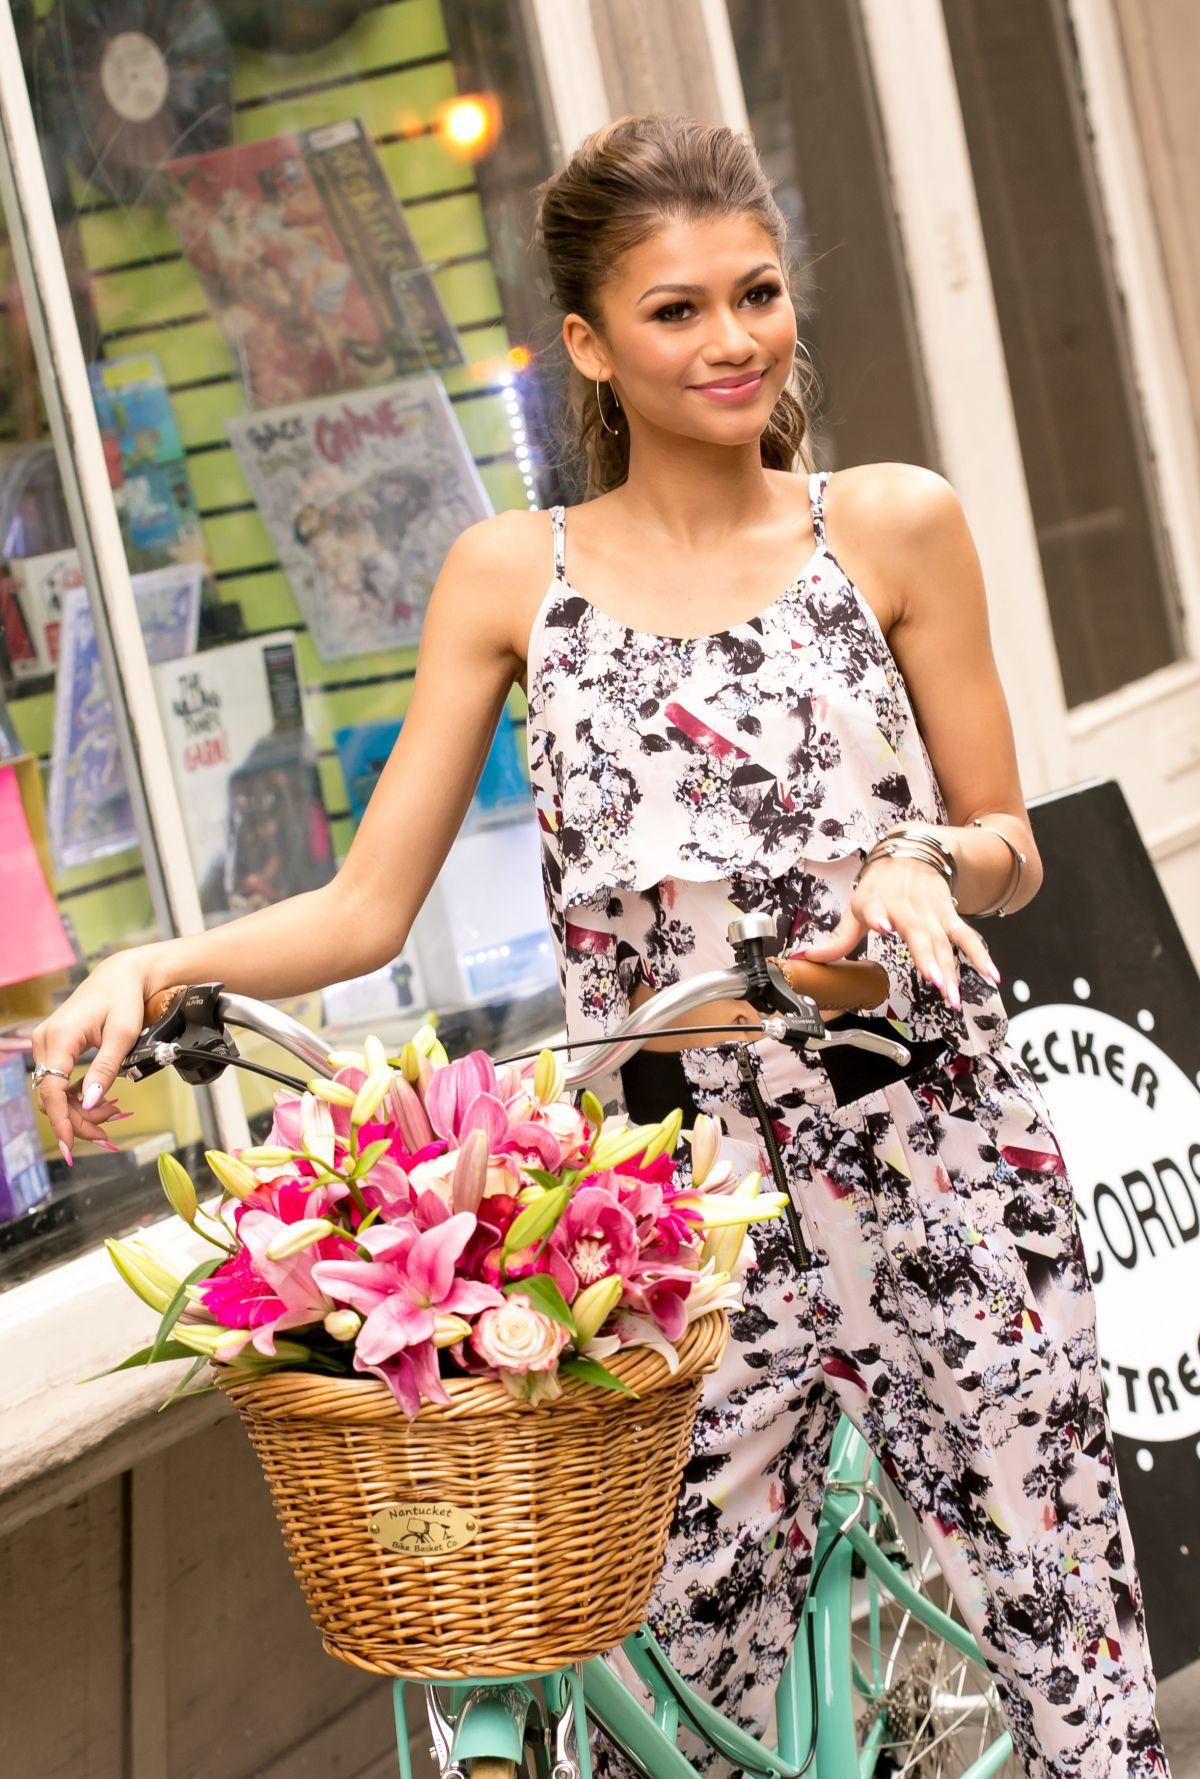 ZENDAYA COLEMAN Photoshoot For Material Girl 2015 Spring